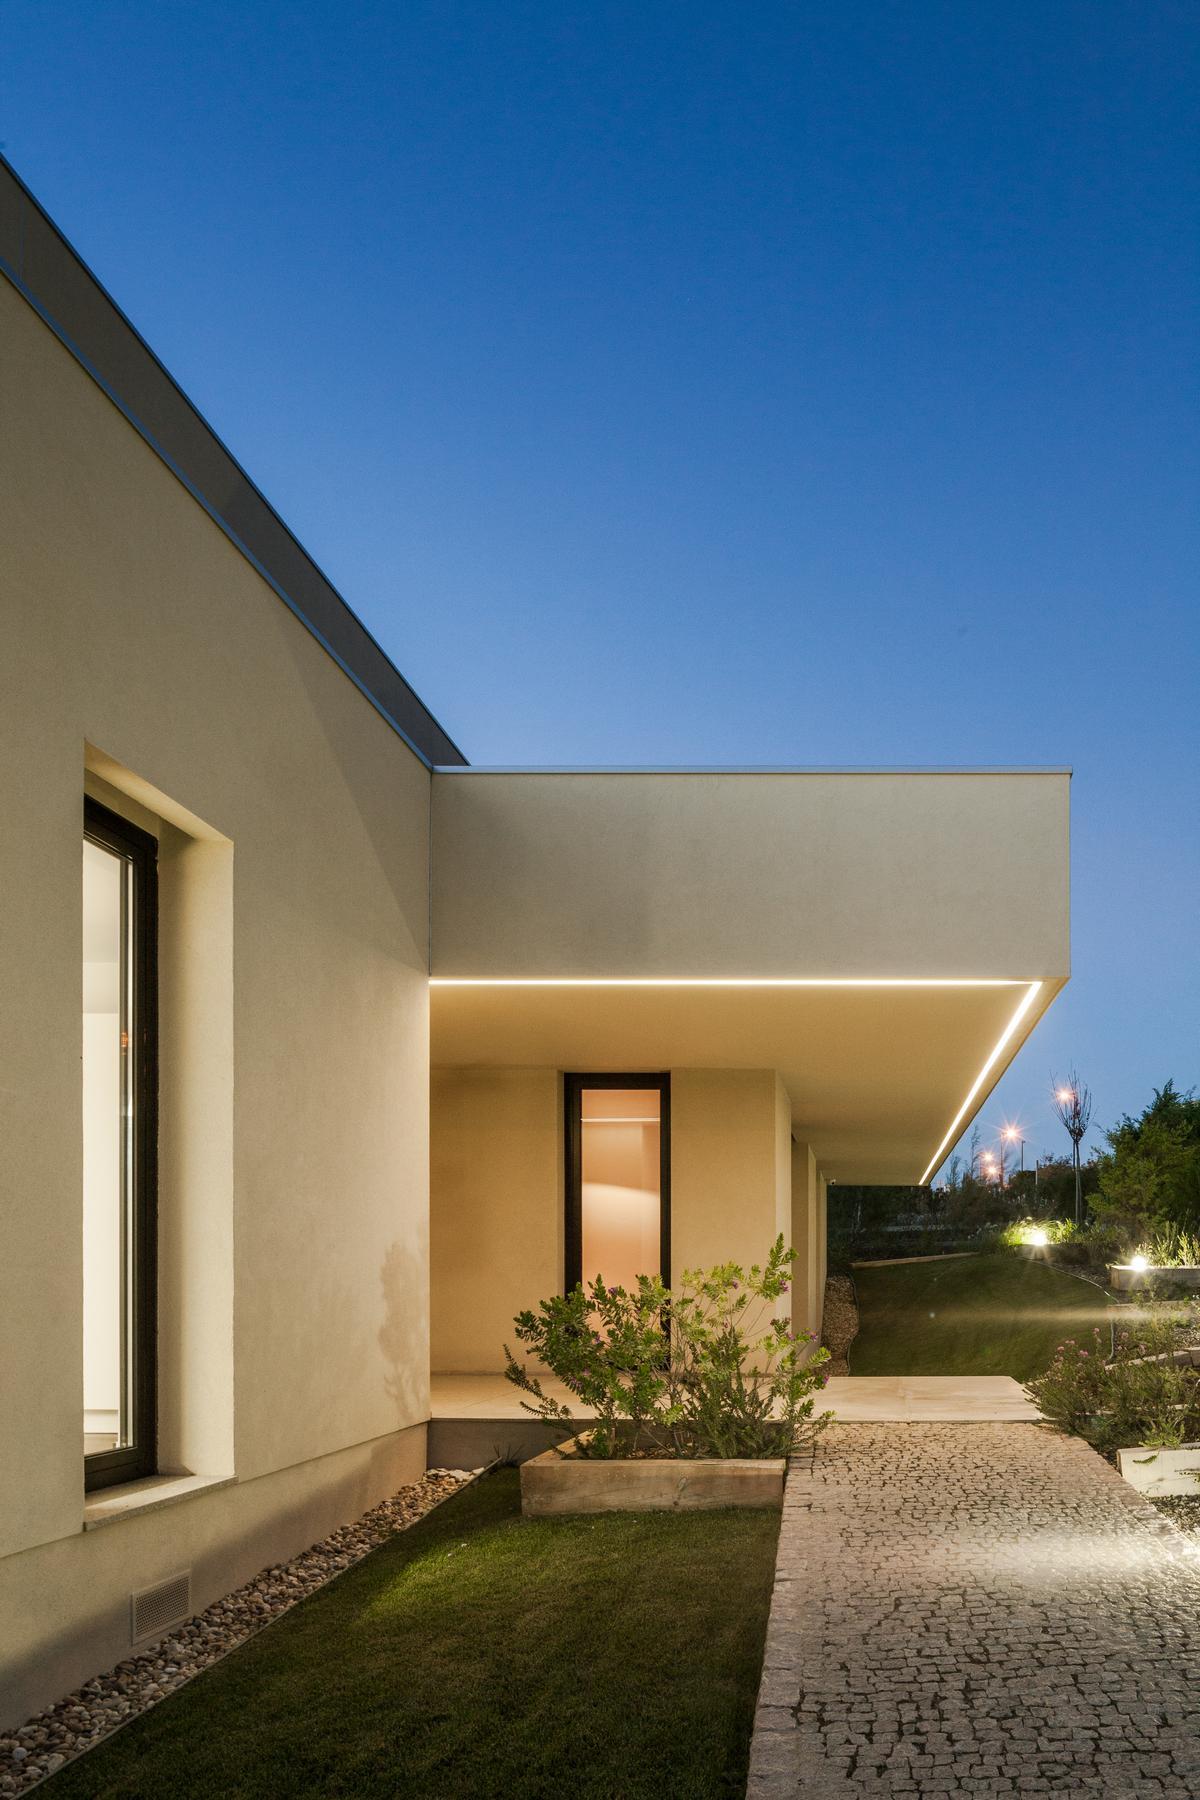 Joao Morgado, Goncalo Anastacio, Portico Vertical, Estudio Urbano Arquitectos, частные дома в Португалии, трехэтажный дом, терраса на крыше дома